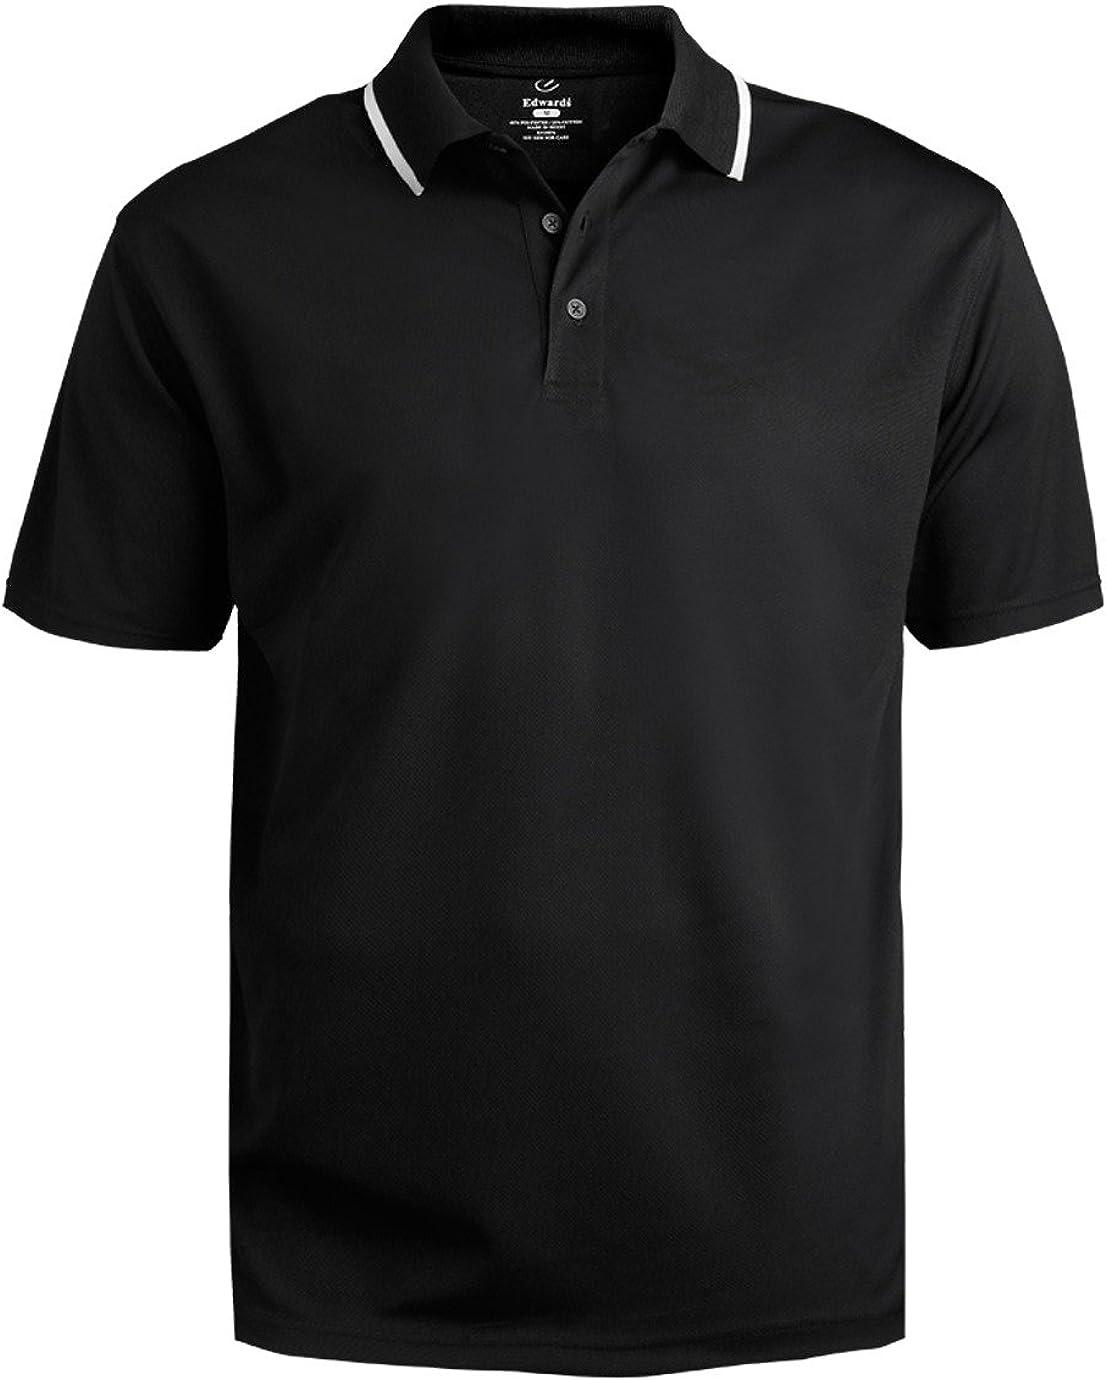 Edwards Garment Men's Big and Tall Performance Polo Shirt, Black, 5XL T